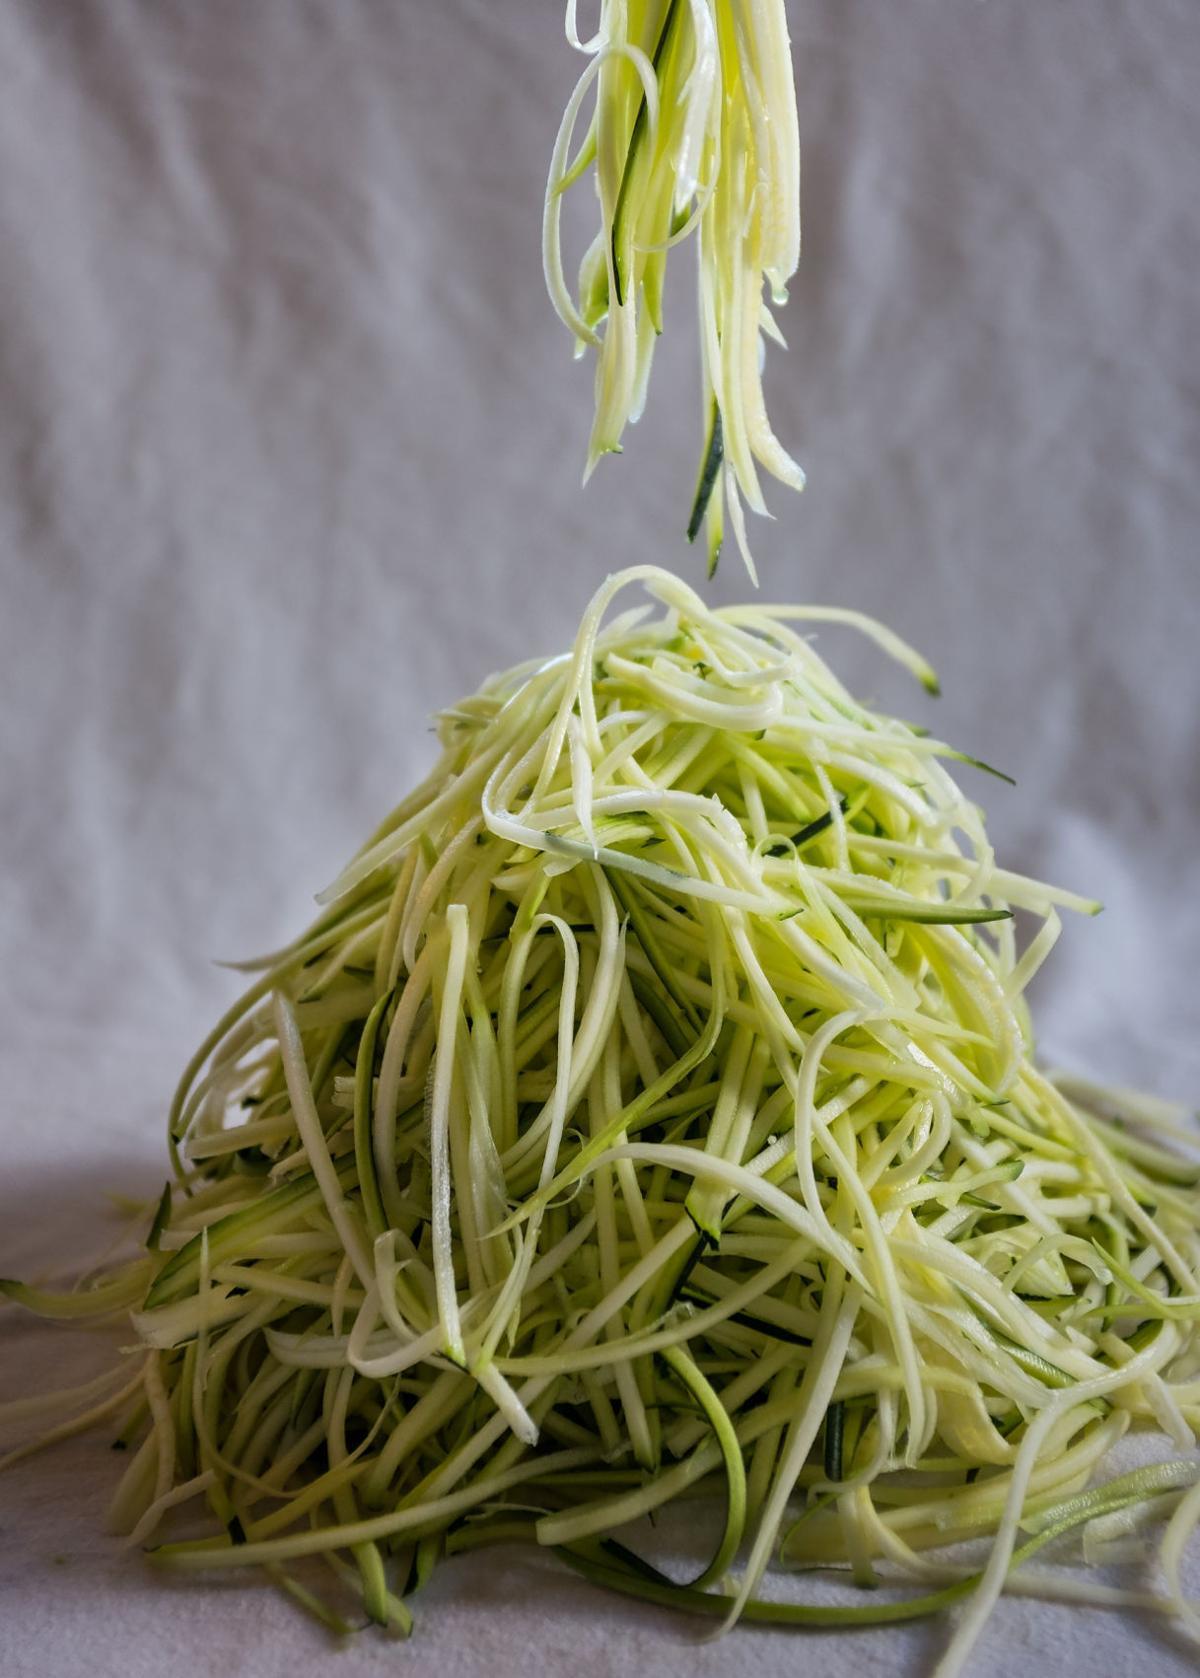 Battle of the Bulk: Strategies for winning the War on Zucchini